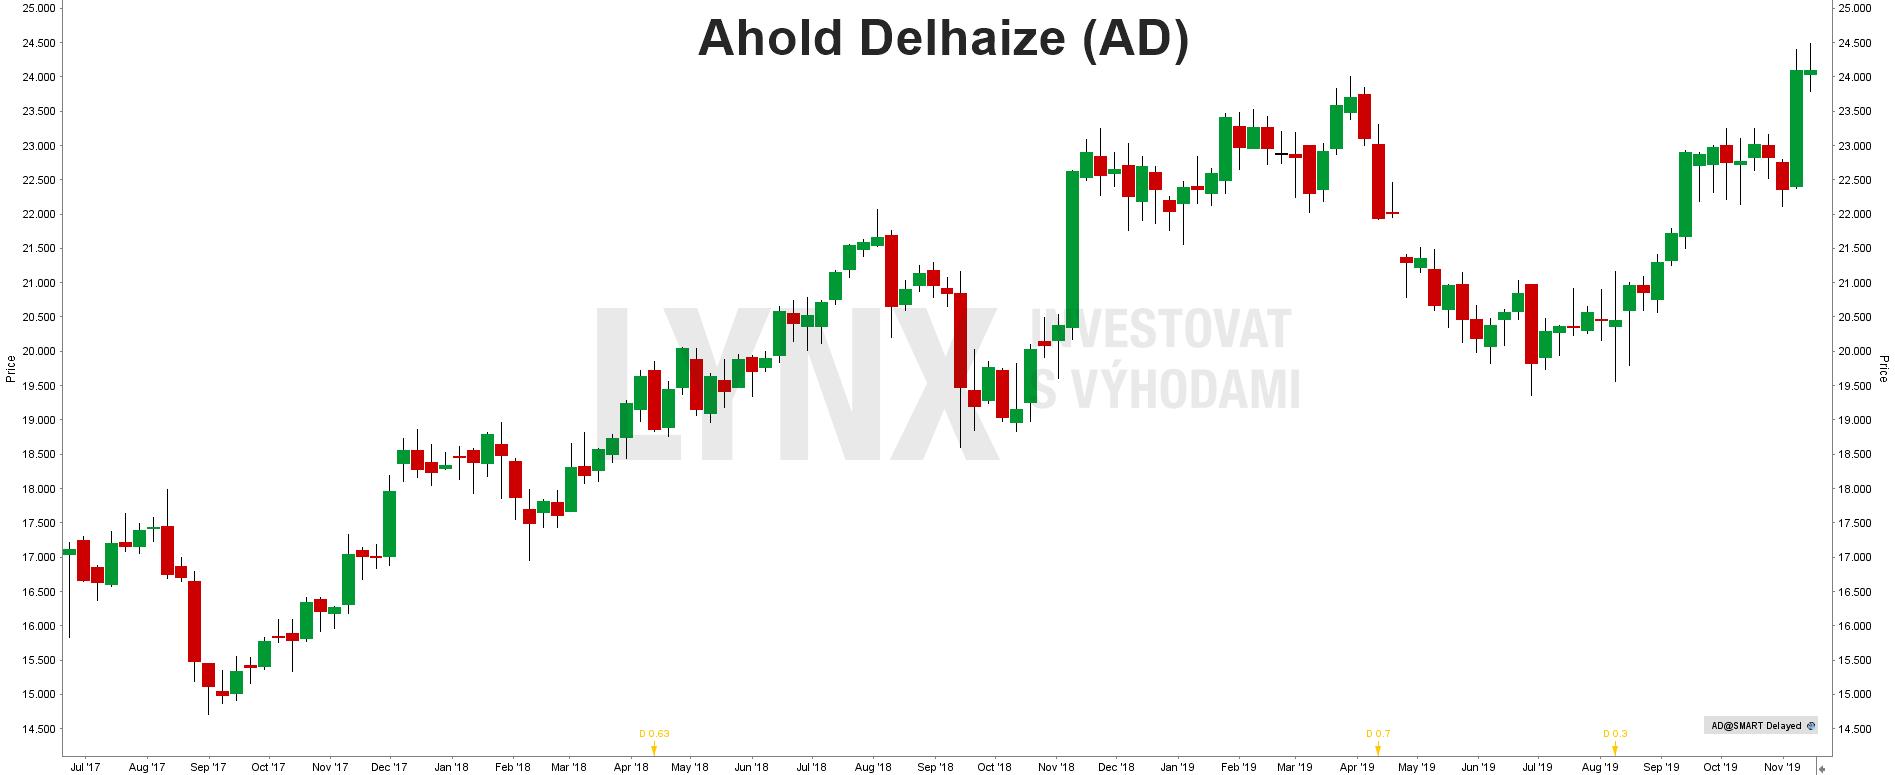 Akcie Ahold Delhaize